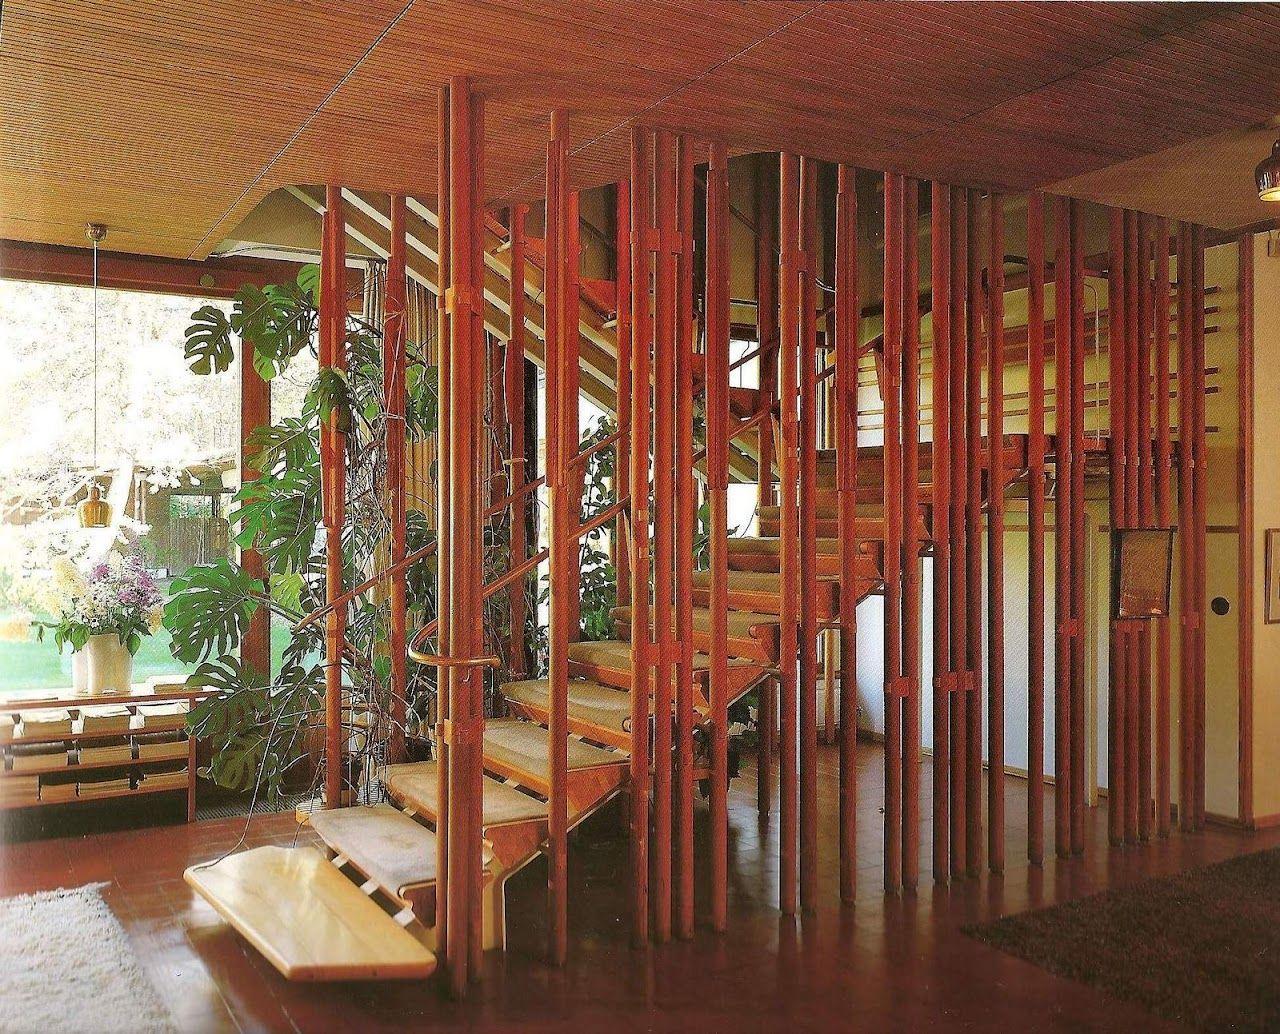 Best Alvar Aalto Villa Mairea Escaleras Arquitectura 640 x 480